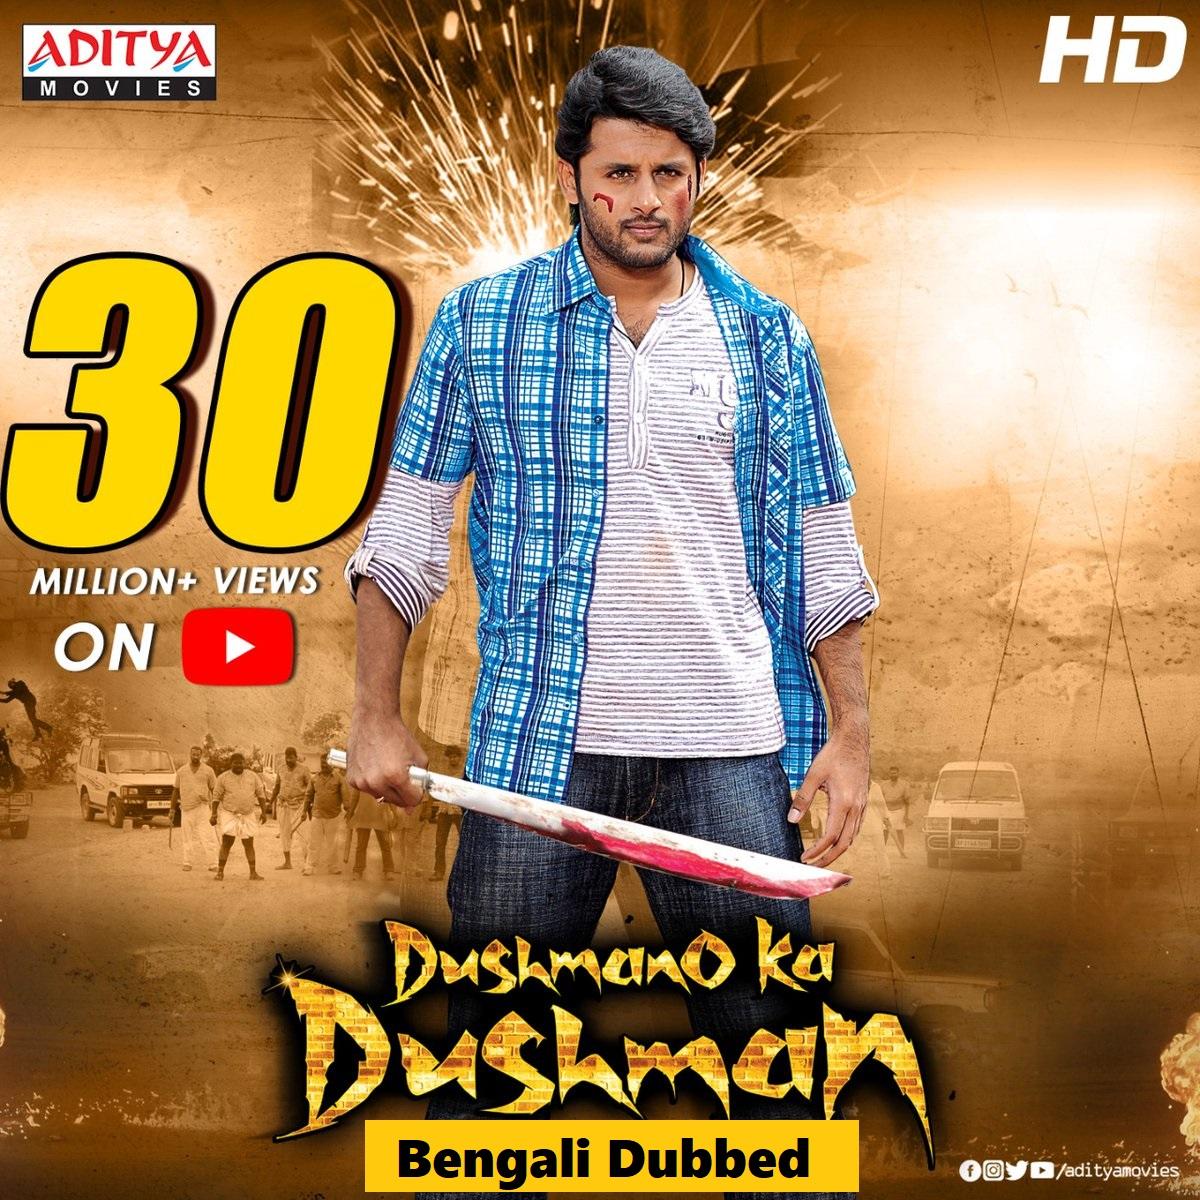 Dushmano Ka Dushman 2021 Bengali Dubbed ORG  720p HDRip 700MB Download